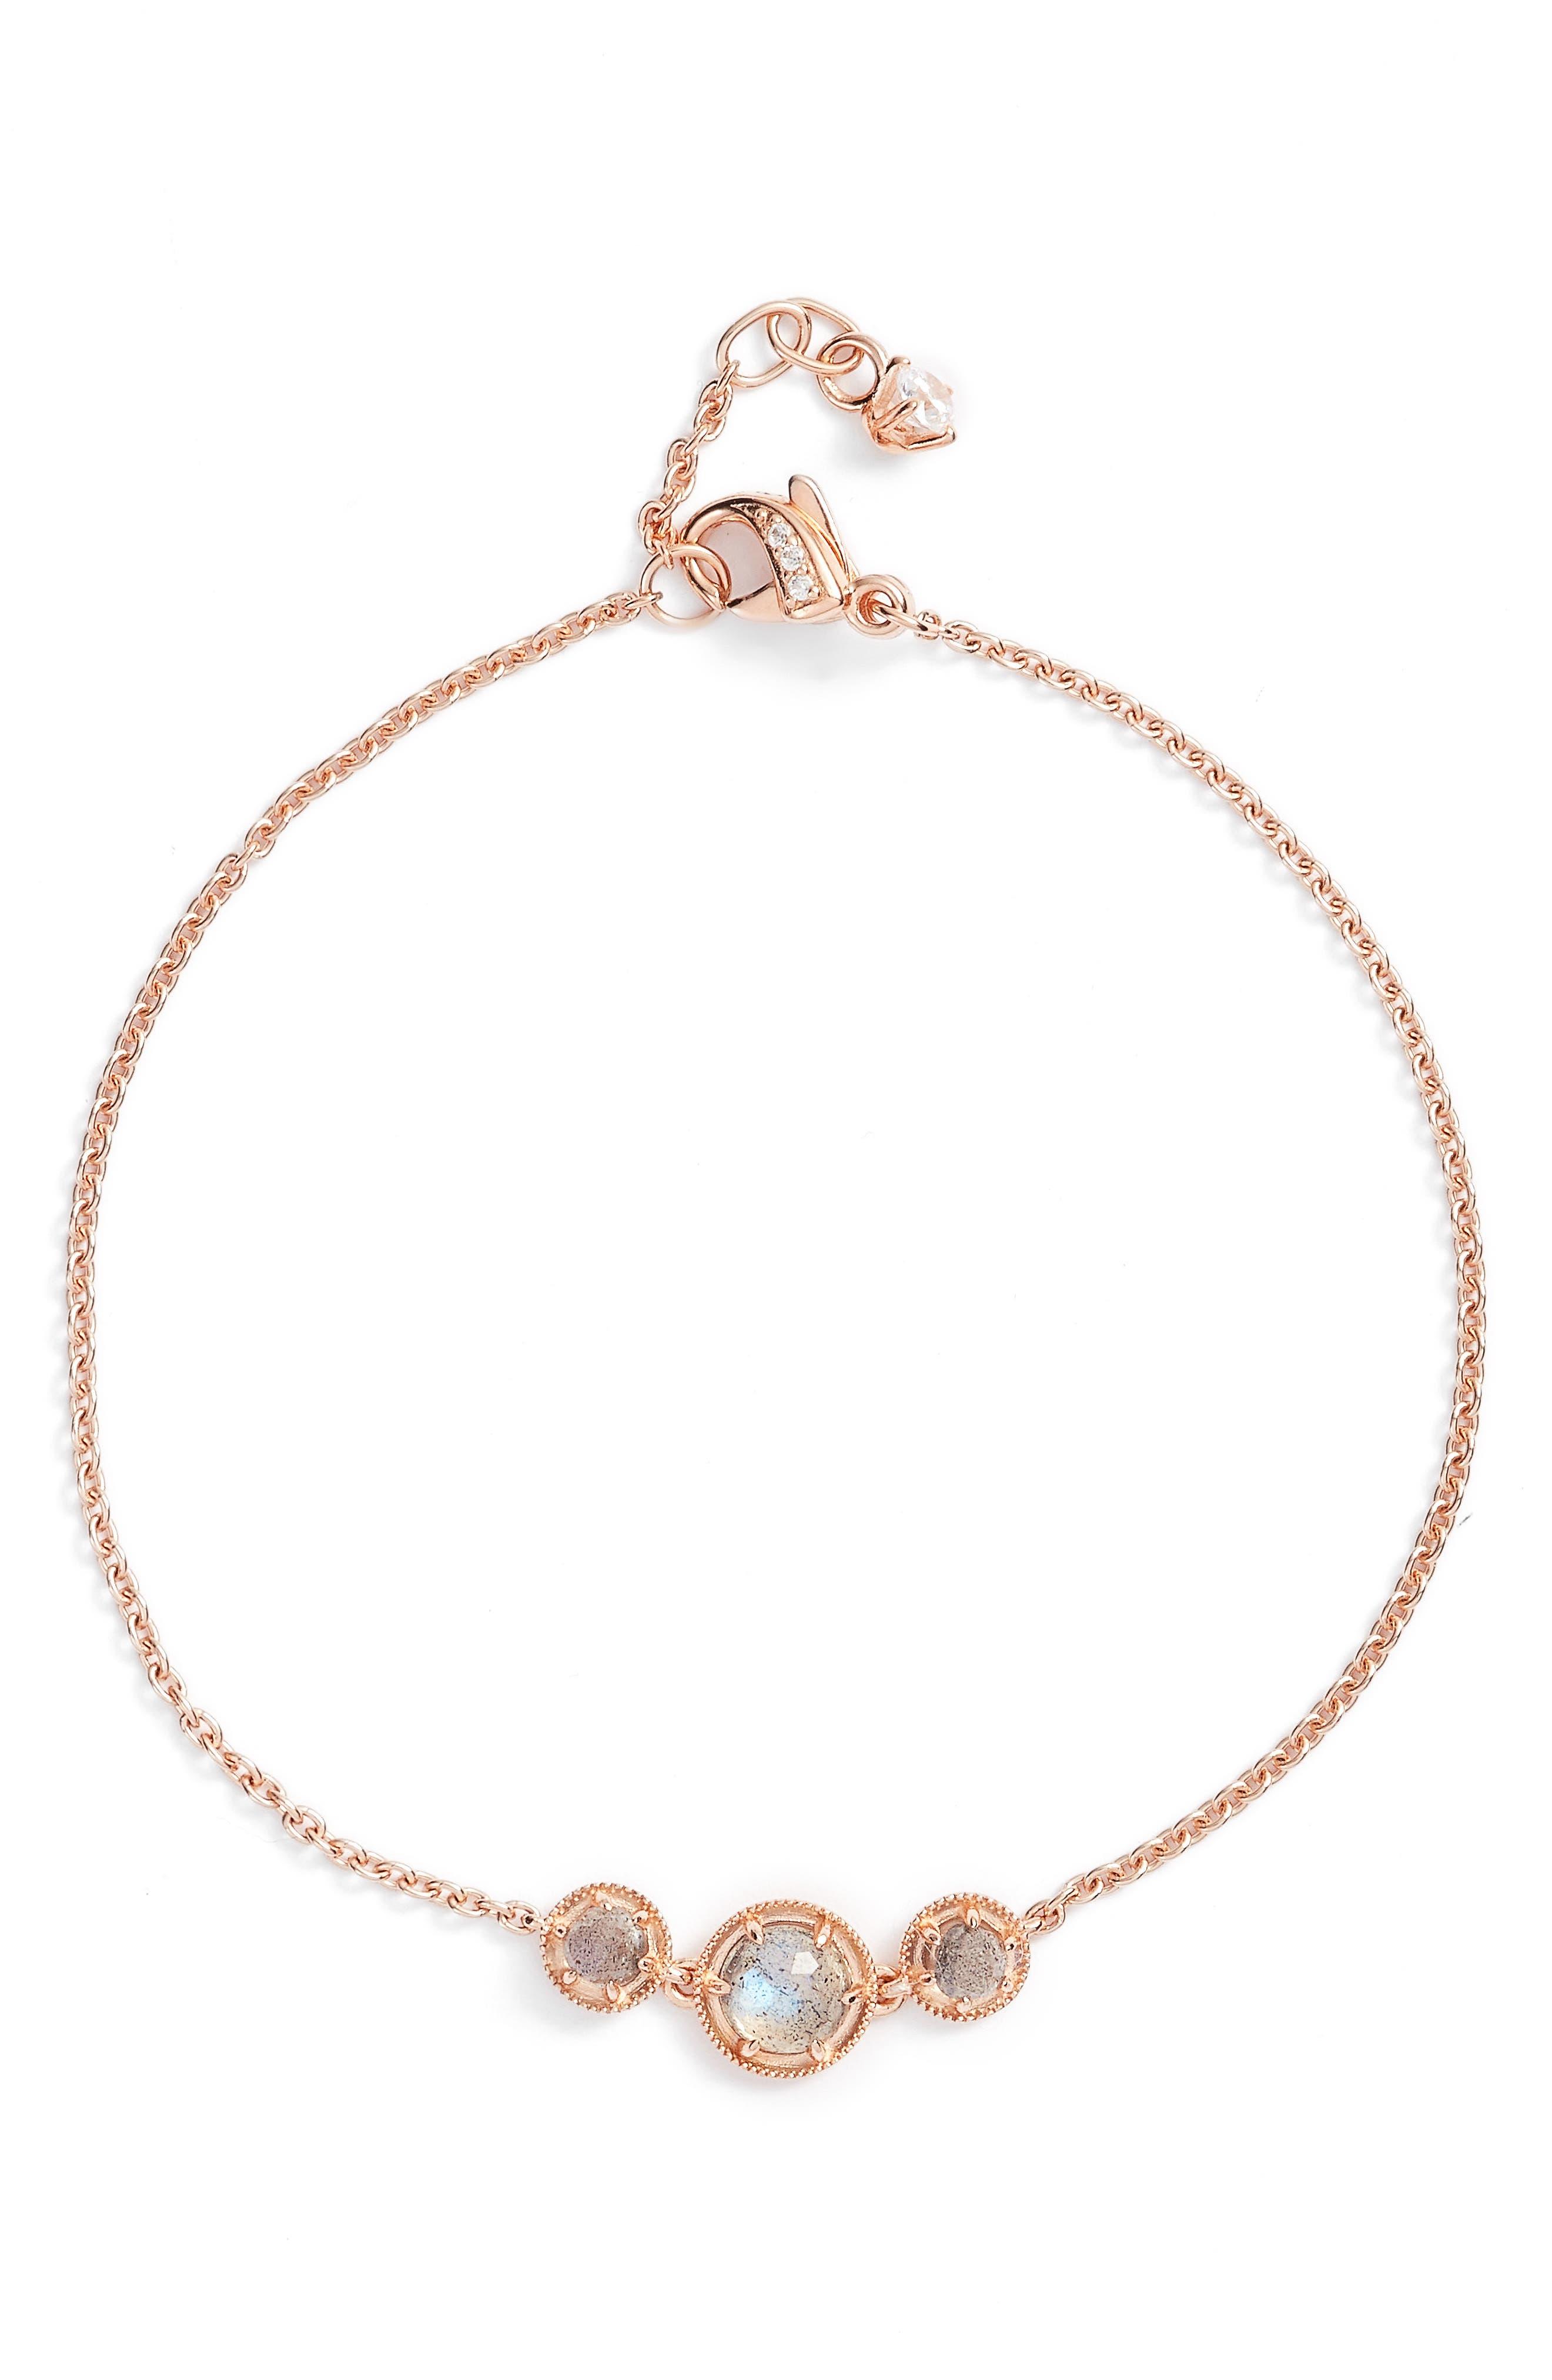 Cleo Semiprecious Doublet Bracelet,                             Main thumbnail 1, color,                             Moonstone/ Rose Gold